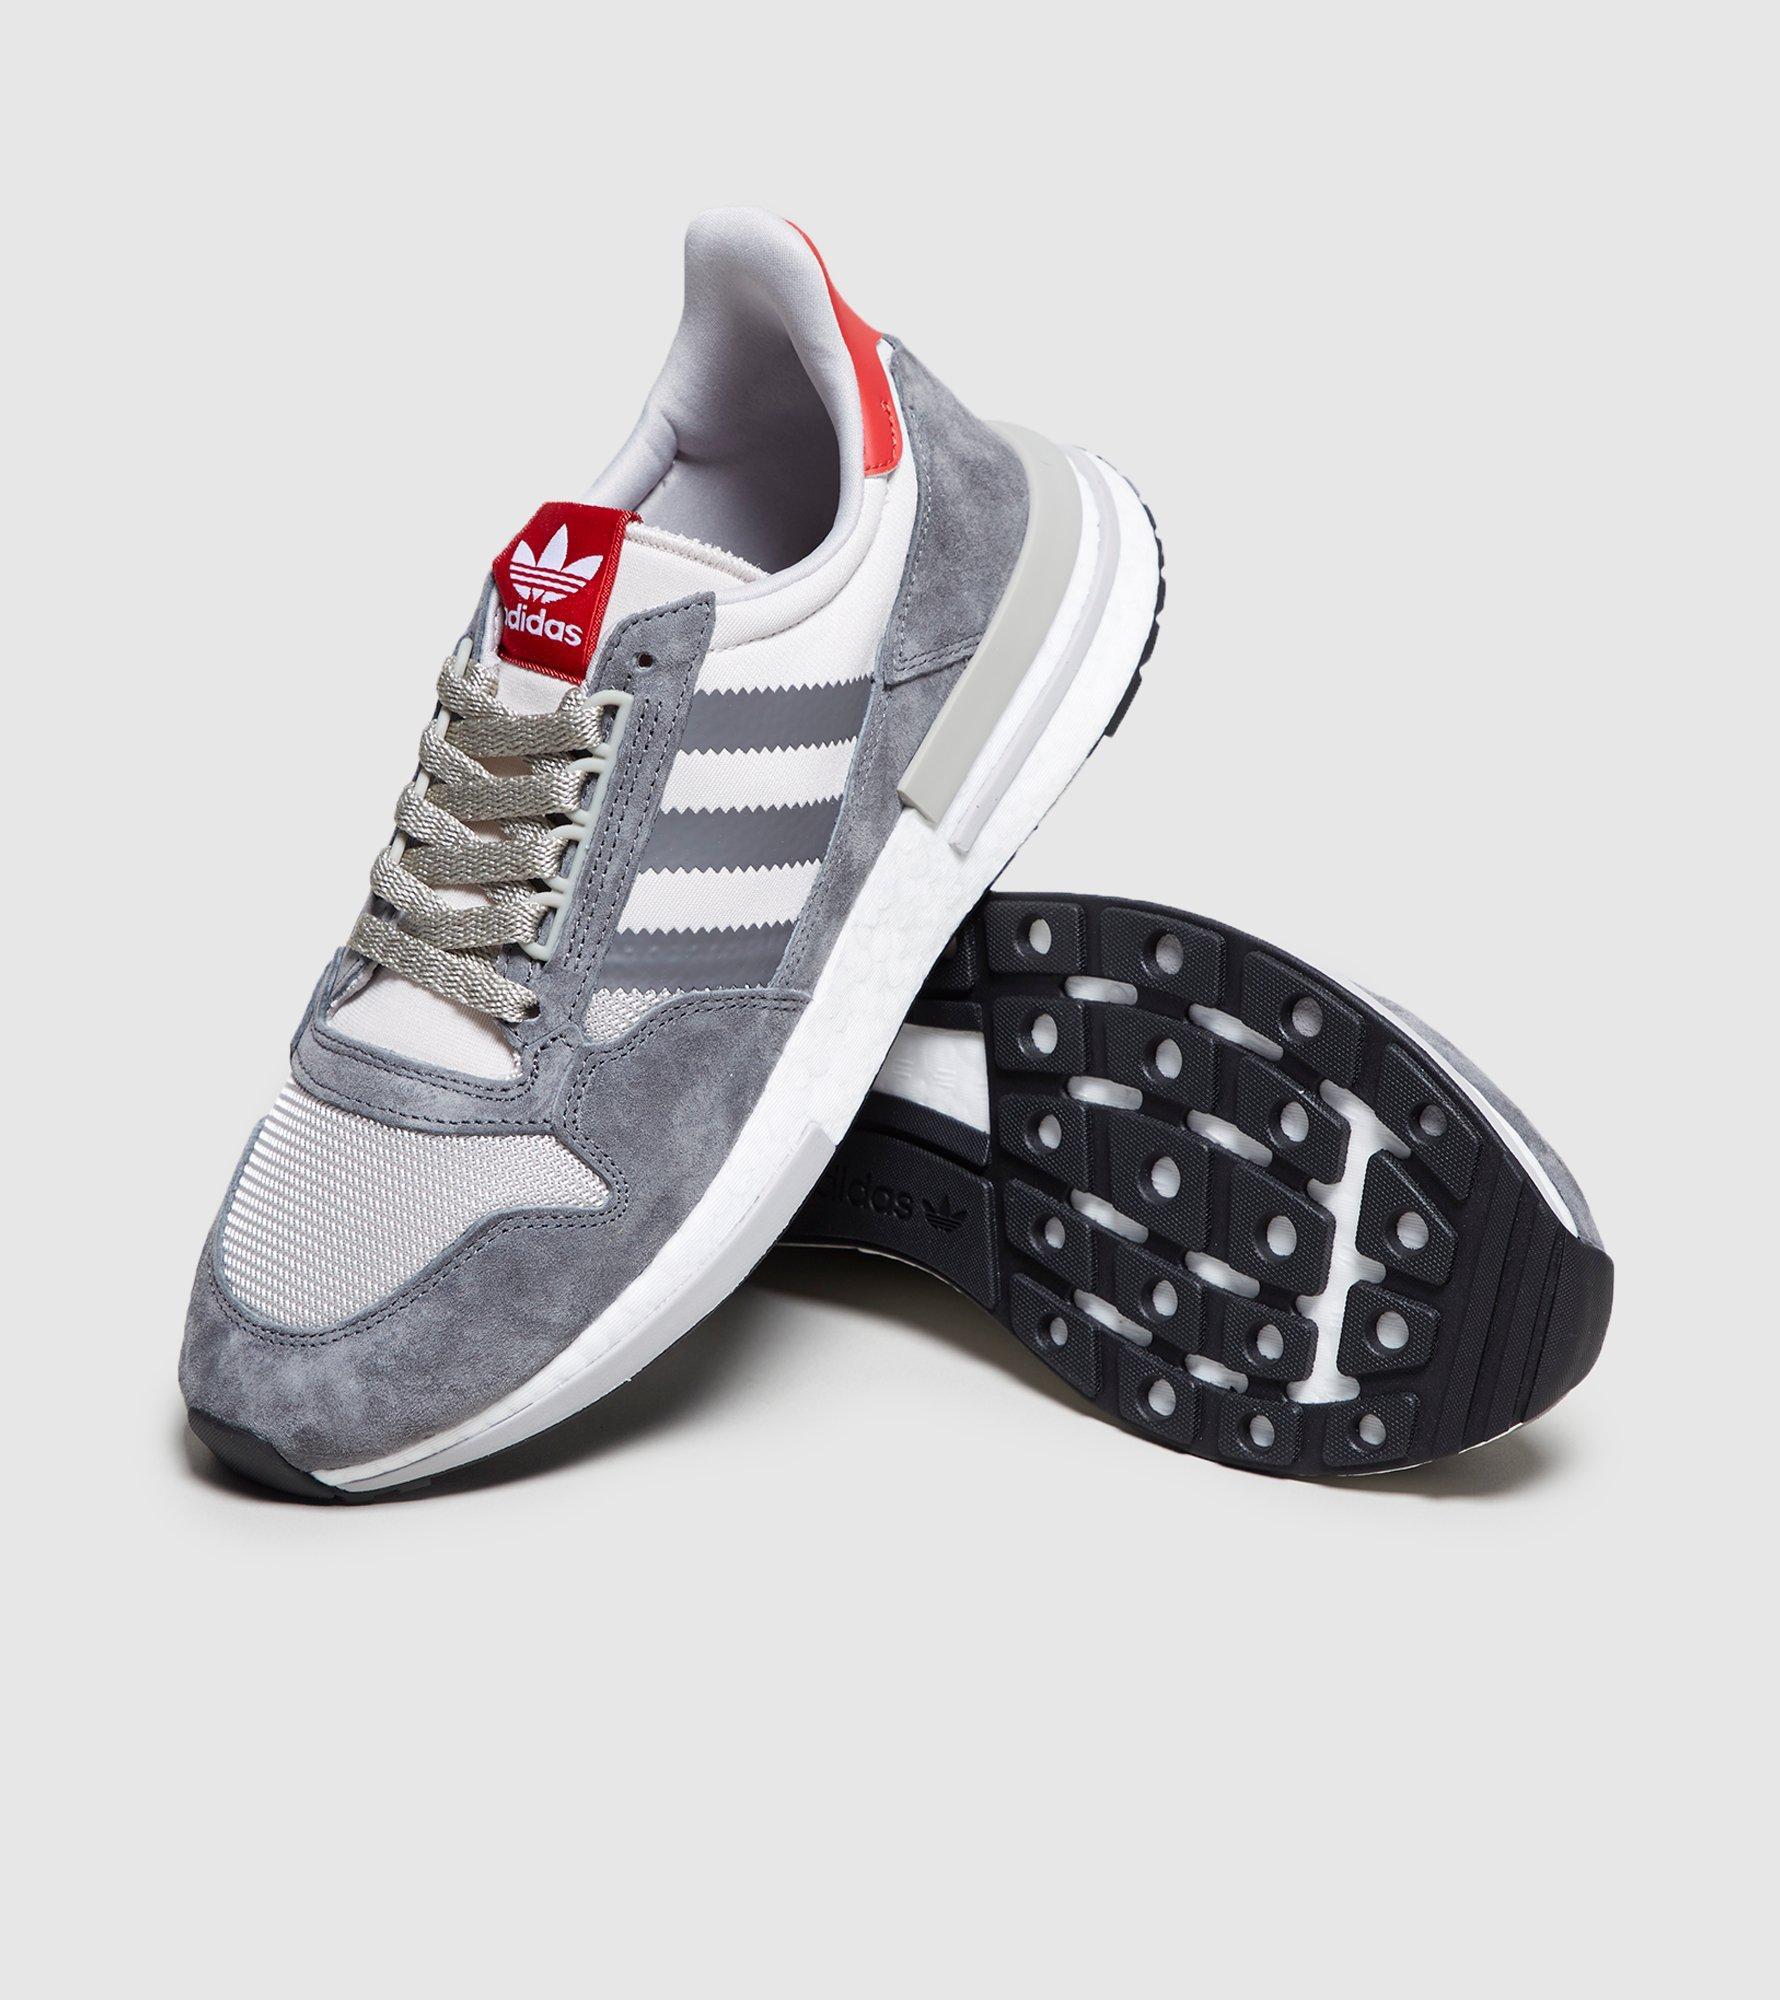 adidas zx 500 og boost